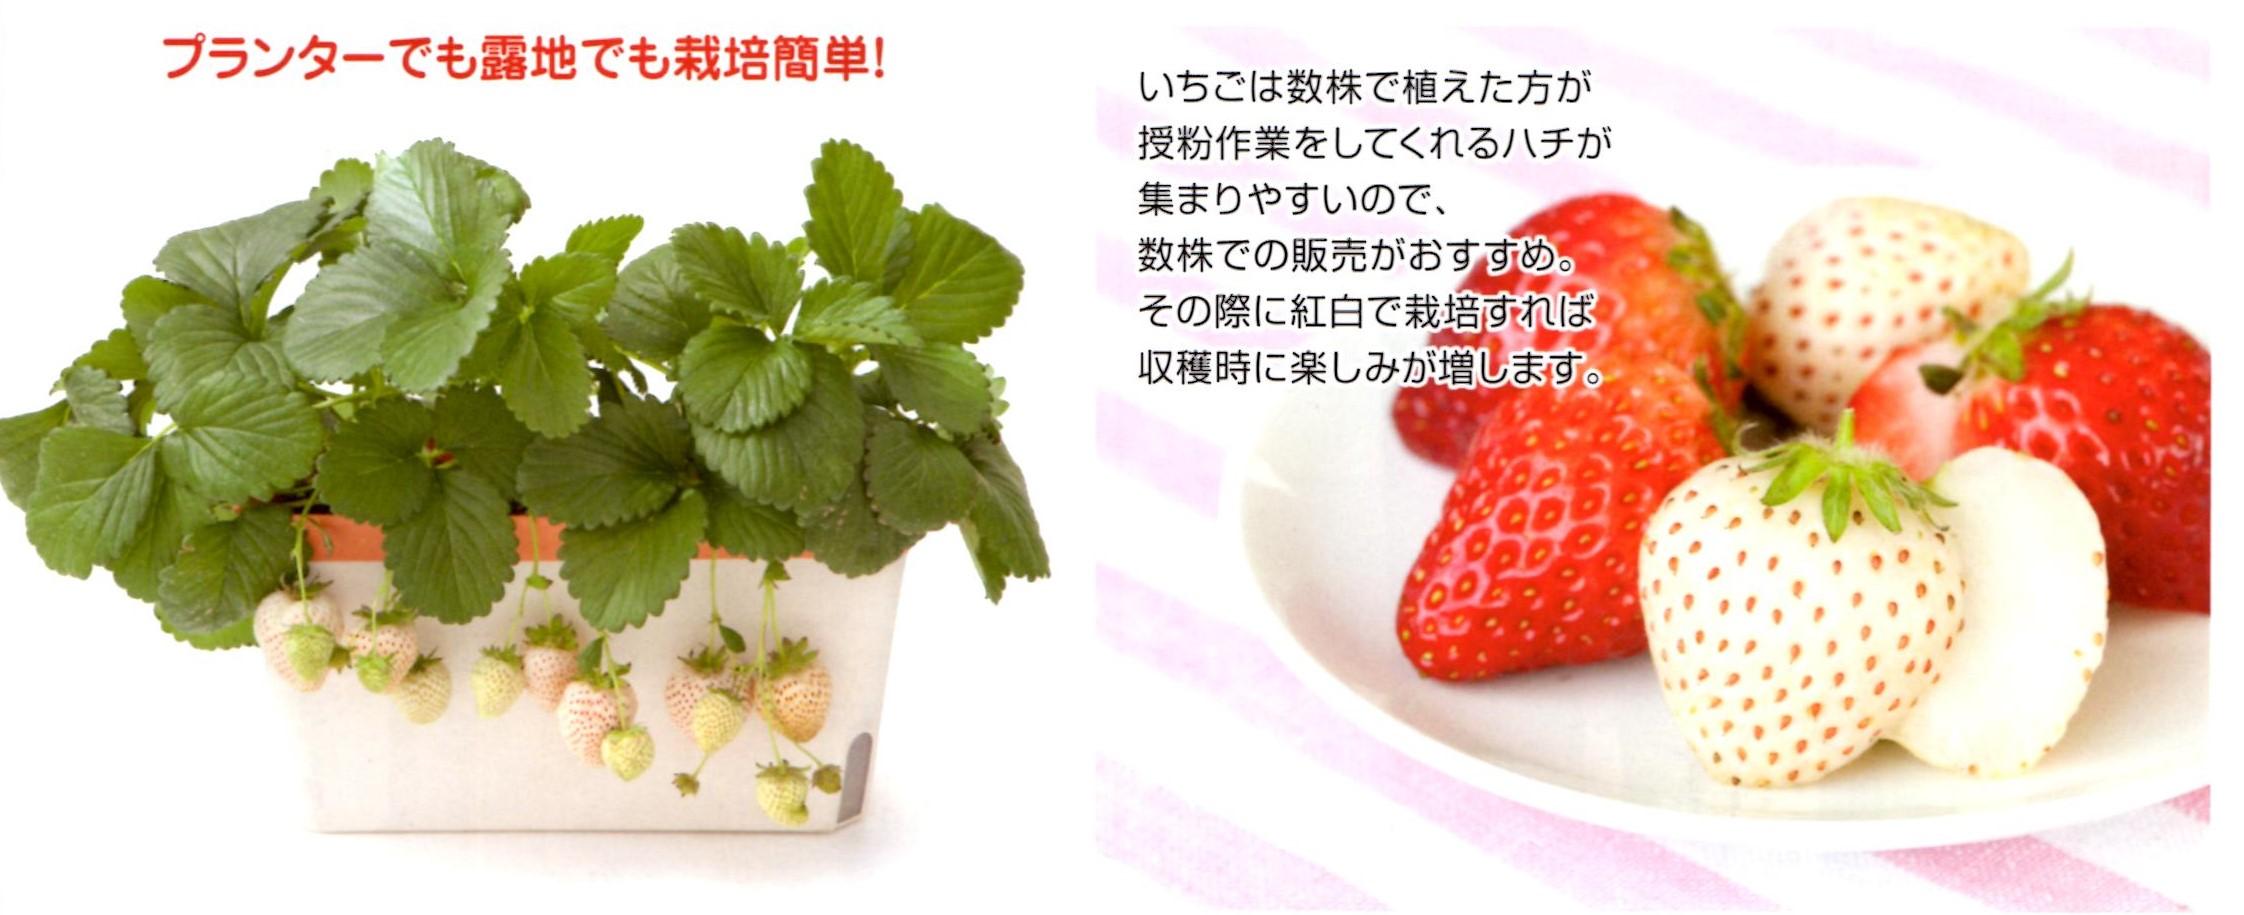 ae-image.jpg